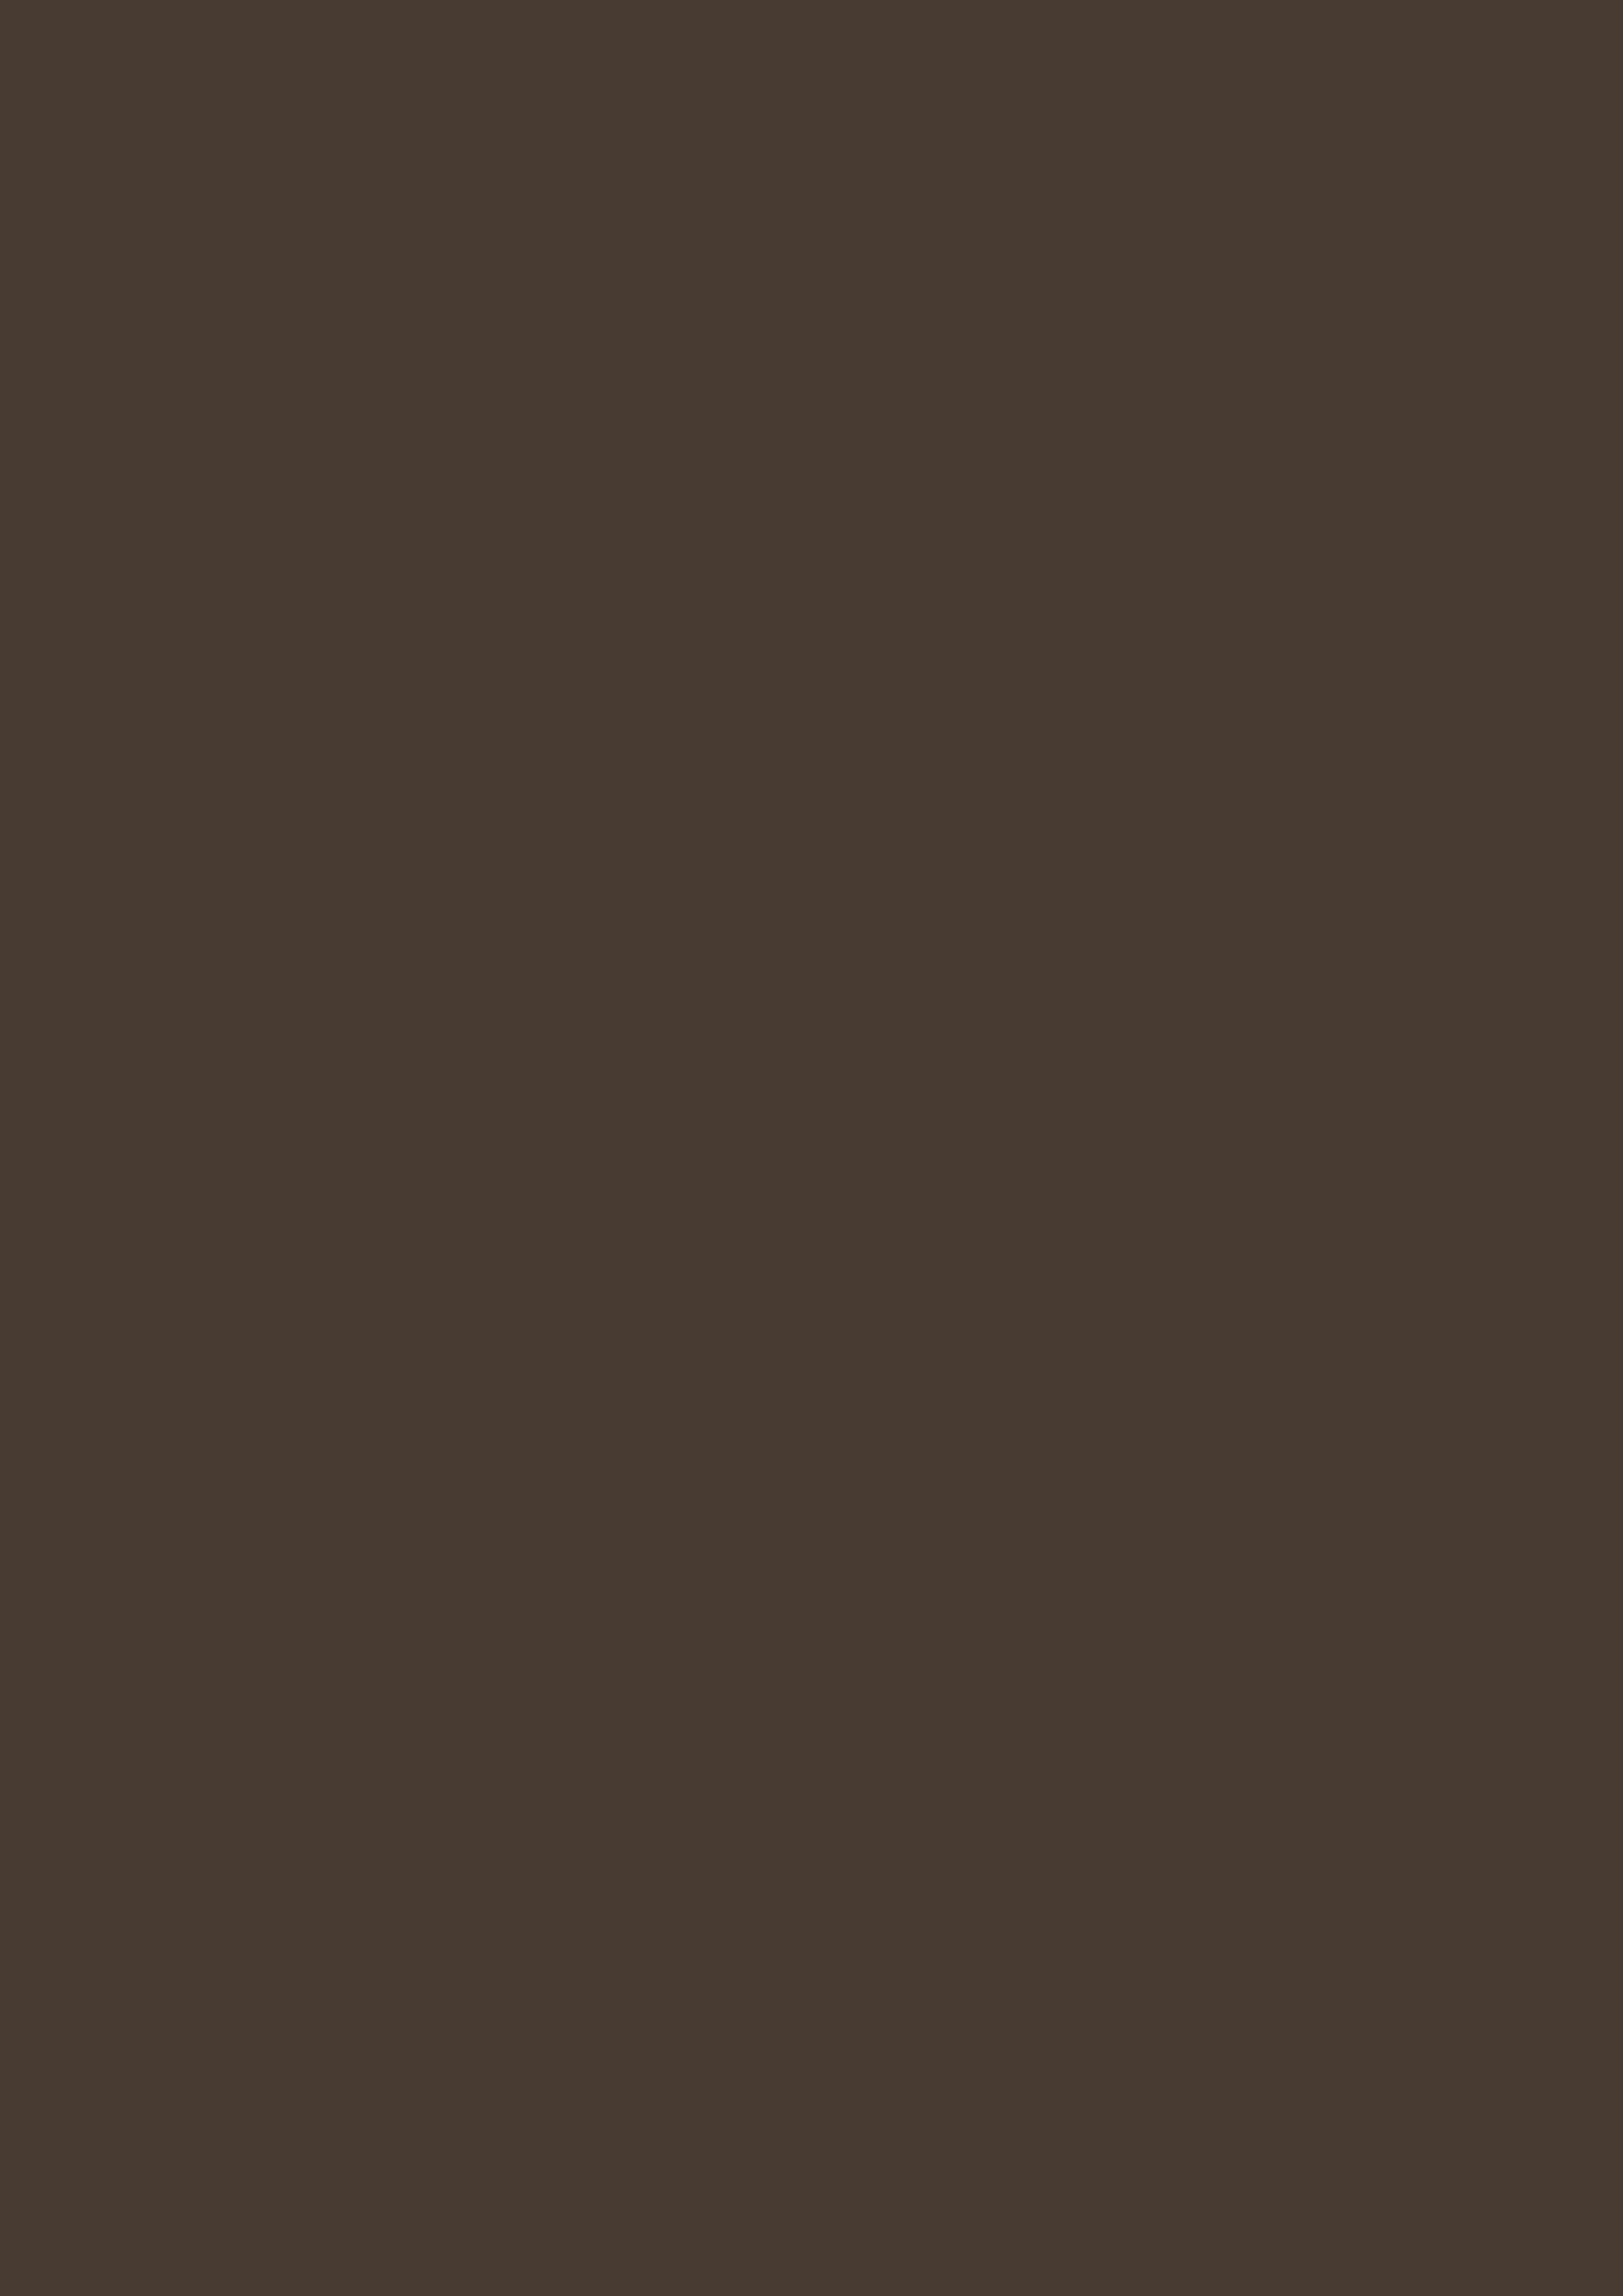 2480x3508 Dark Lava Solid Color Background